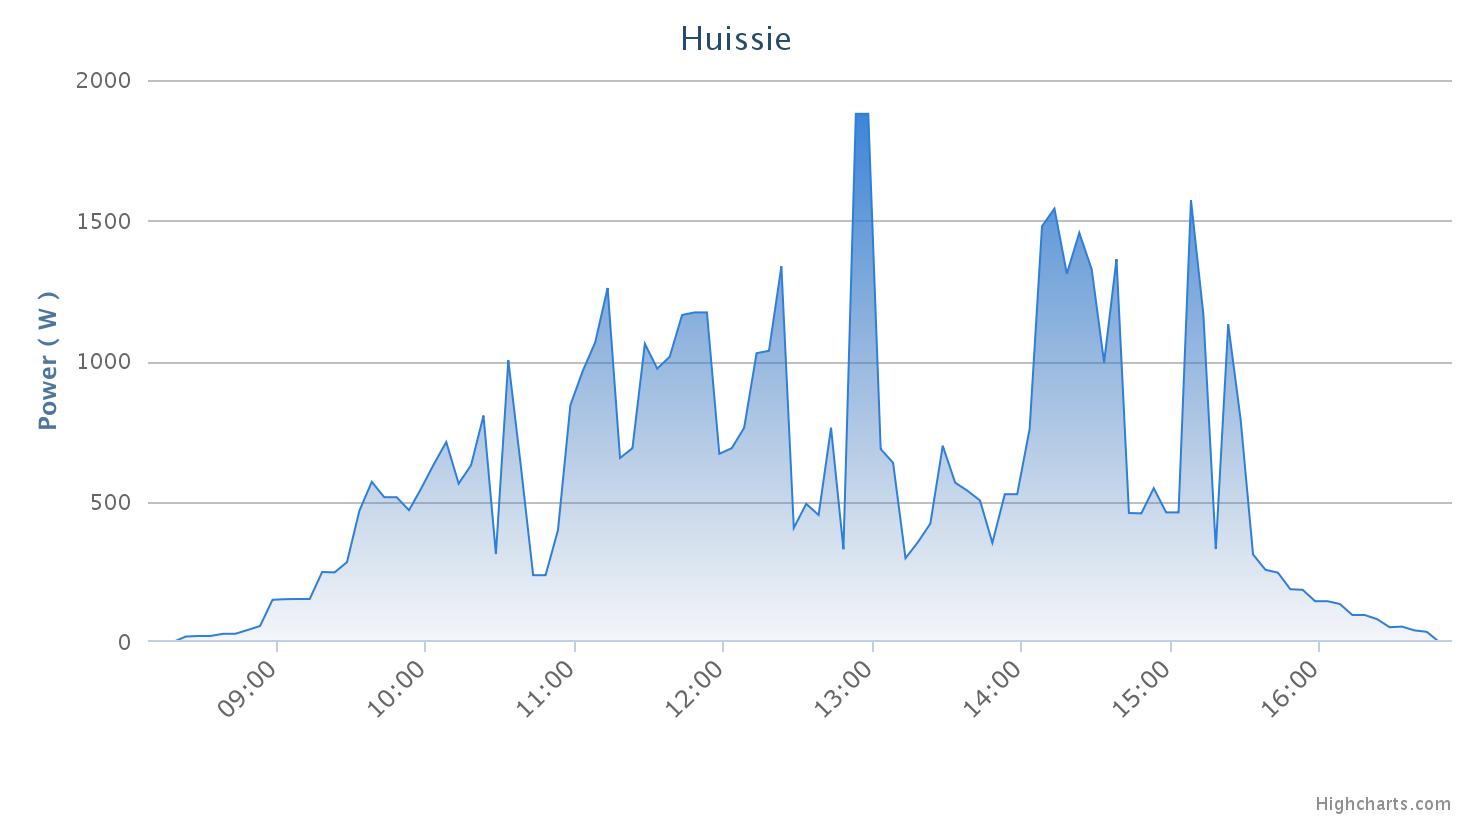 http://upload.mattie-systems.nl/uploads/20676-chart_(1).png